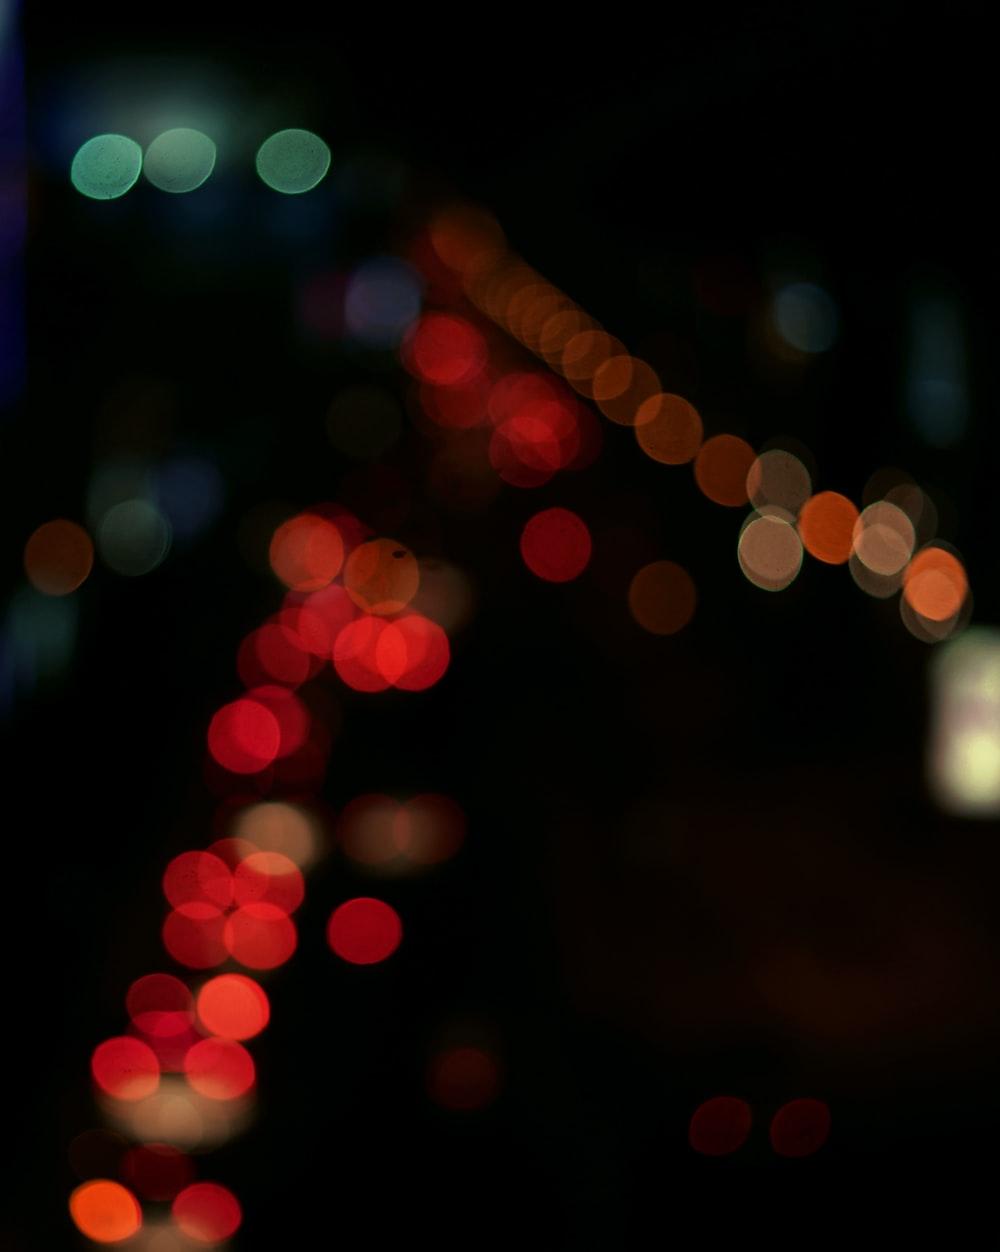 Red Lights Photo Free Lighting Image On Unsplash